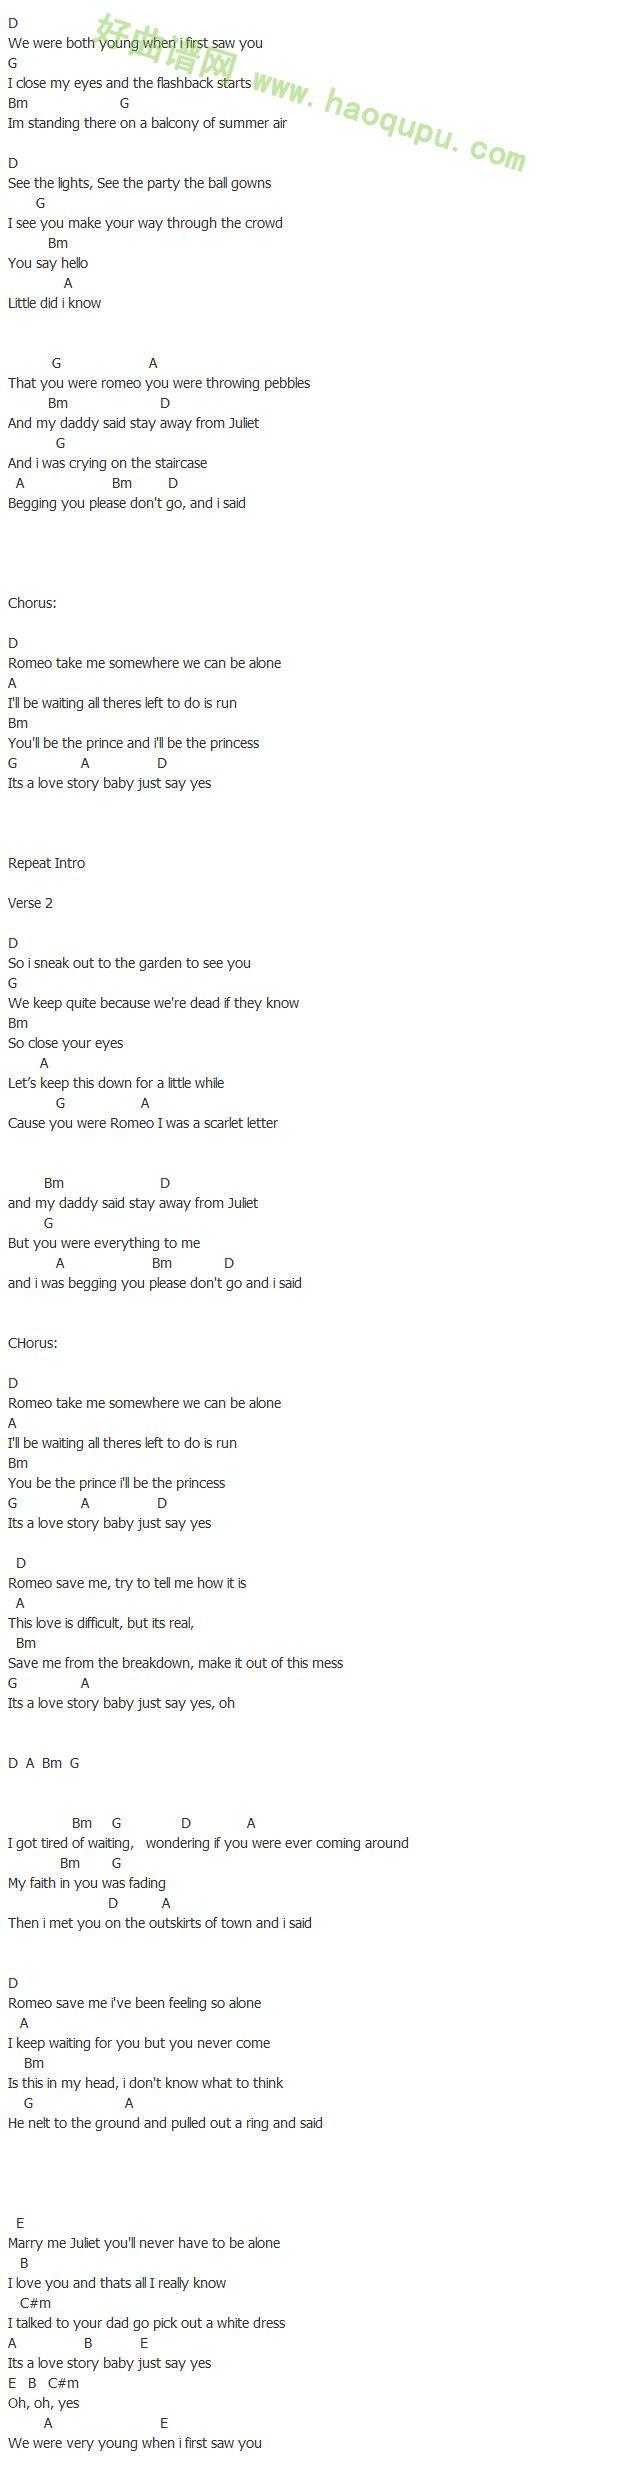 《love story》 - 吉他谱